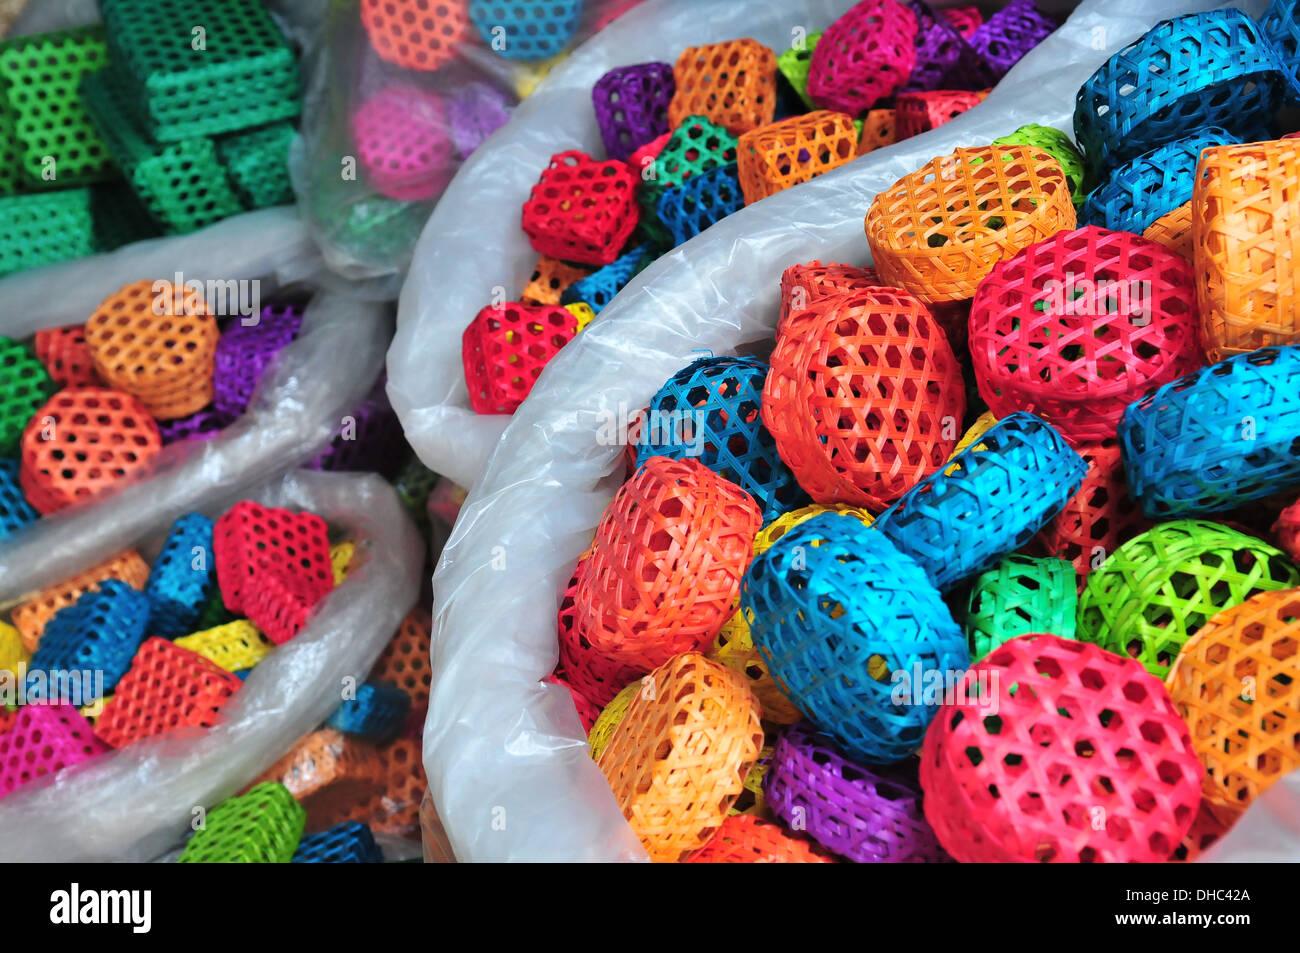 Colourful Handicrafts At Bangkok Chatuchak Weekend Market Thailand